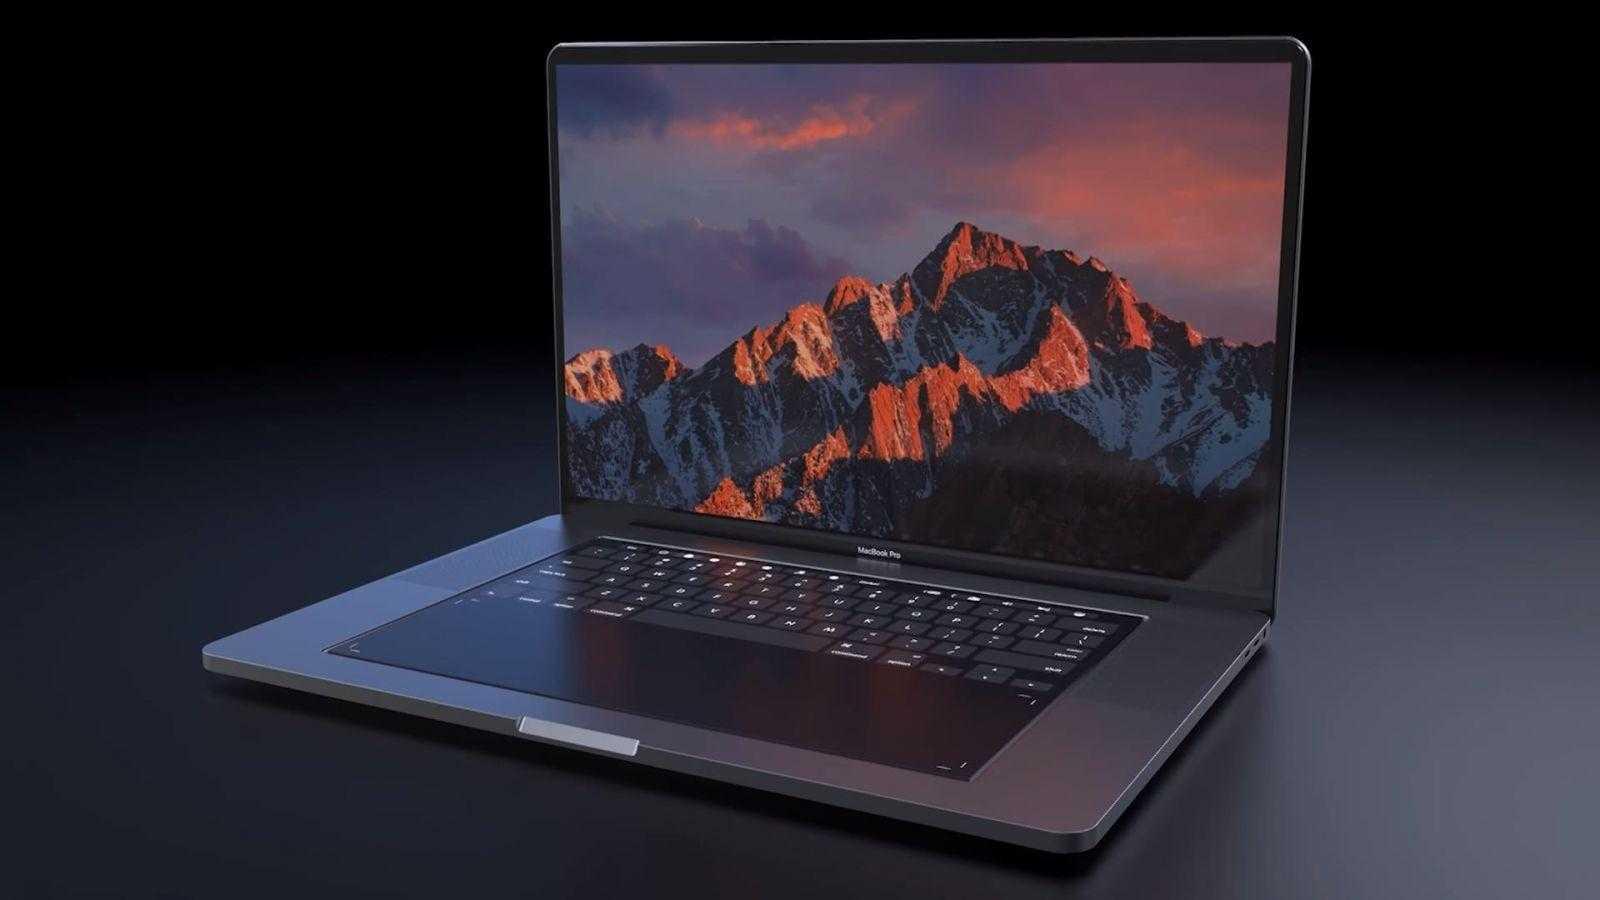 ТОП-9 крутых фишек Apple MacBook Pro 2018 (Bezymyannyj iloveimg compressed)